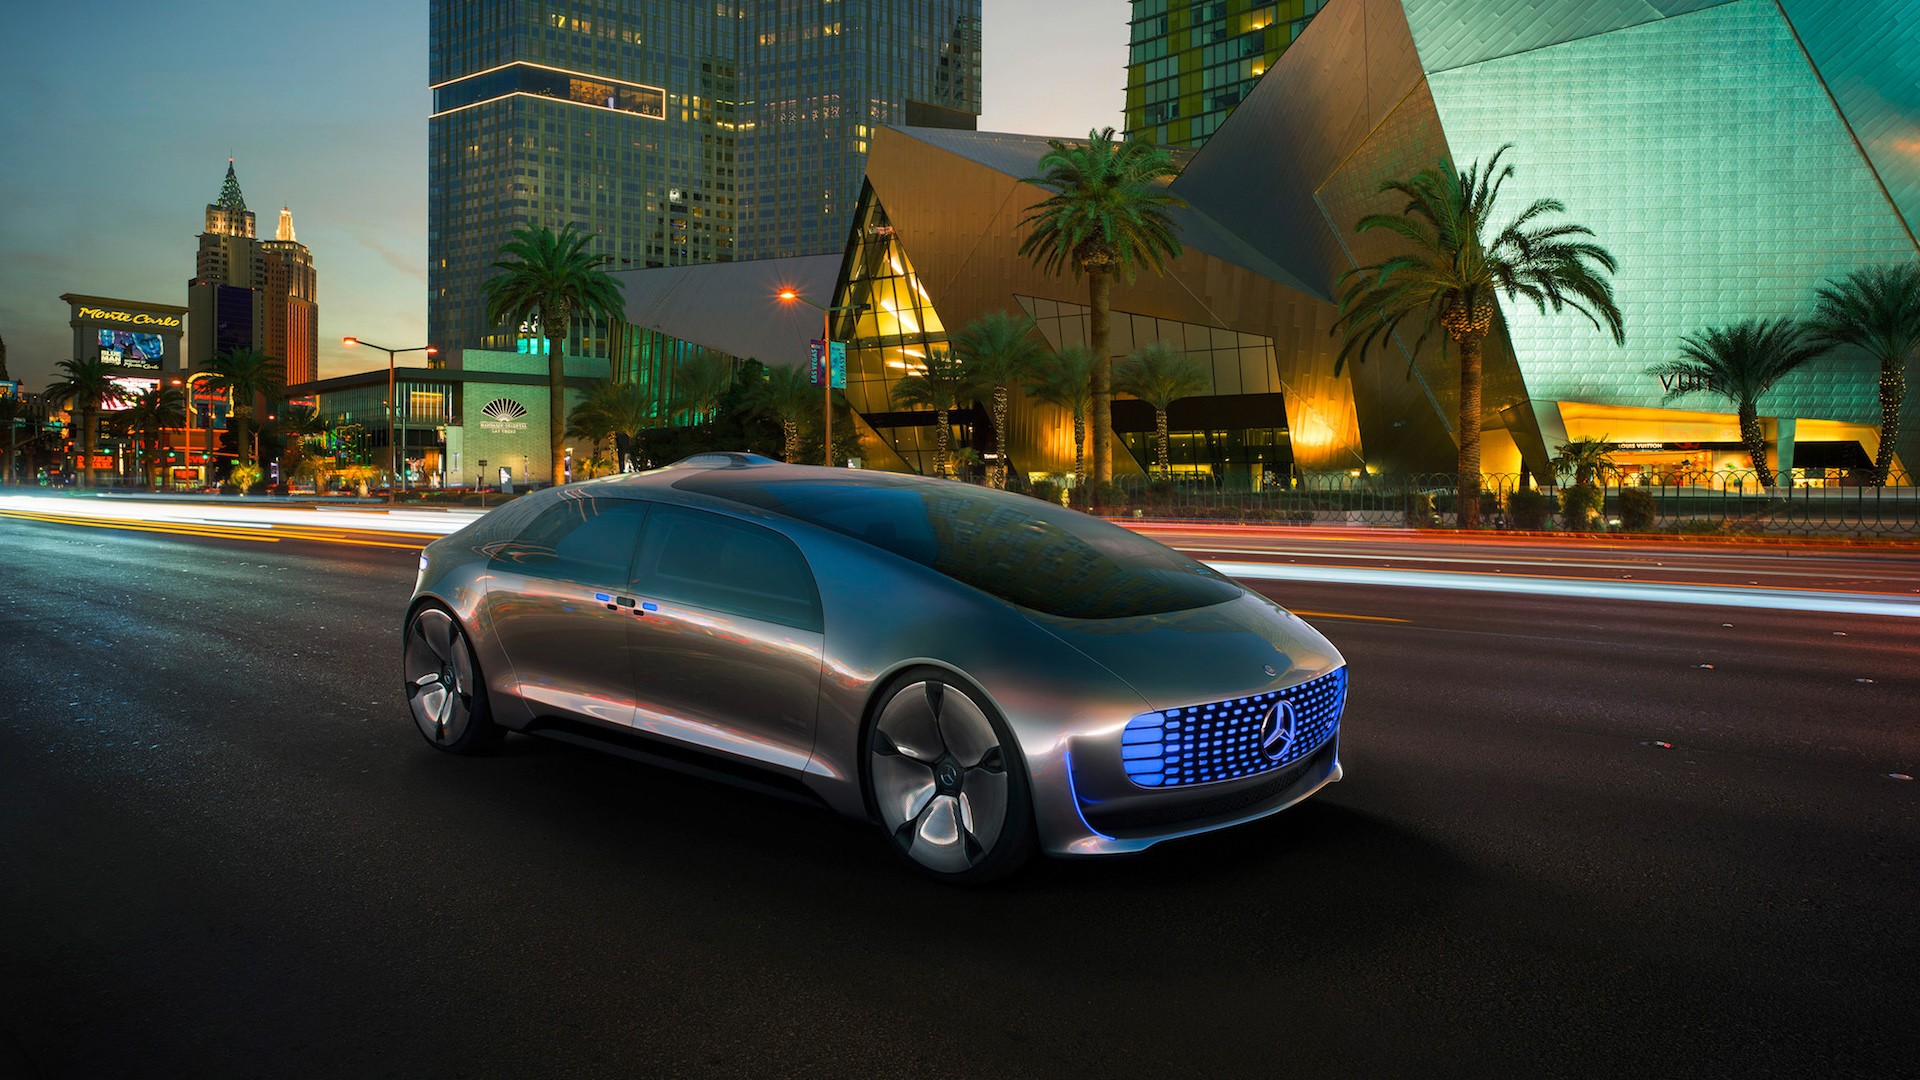 Mercedes F 015 >> 2015 Mercedes Benz F 015 Luxury Wallpaper | HD Car Wallpapers | ID #5030